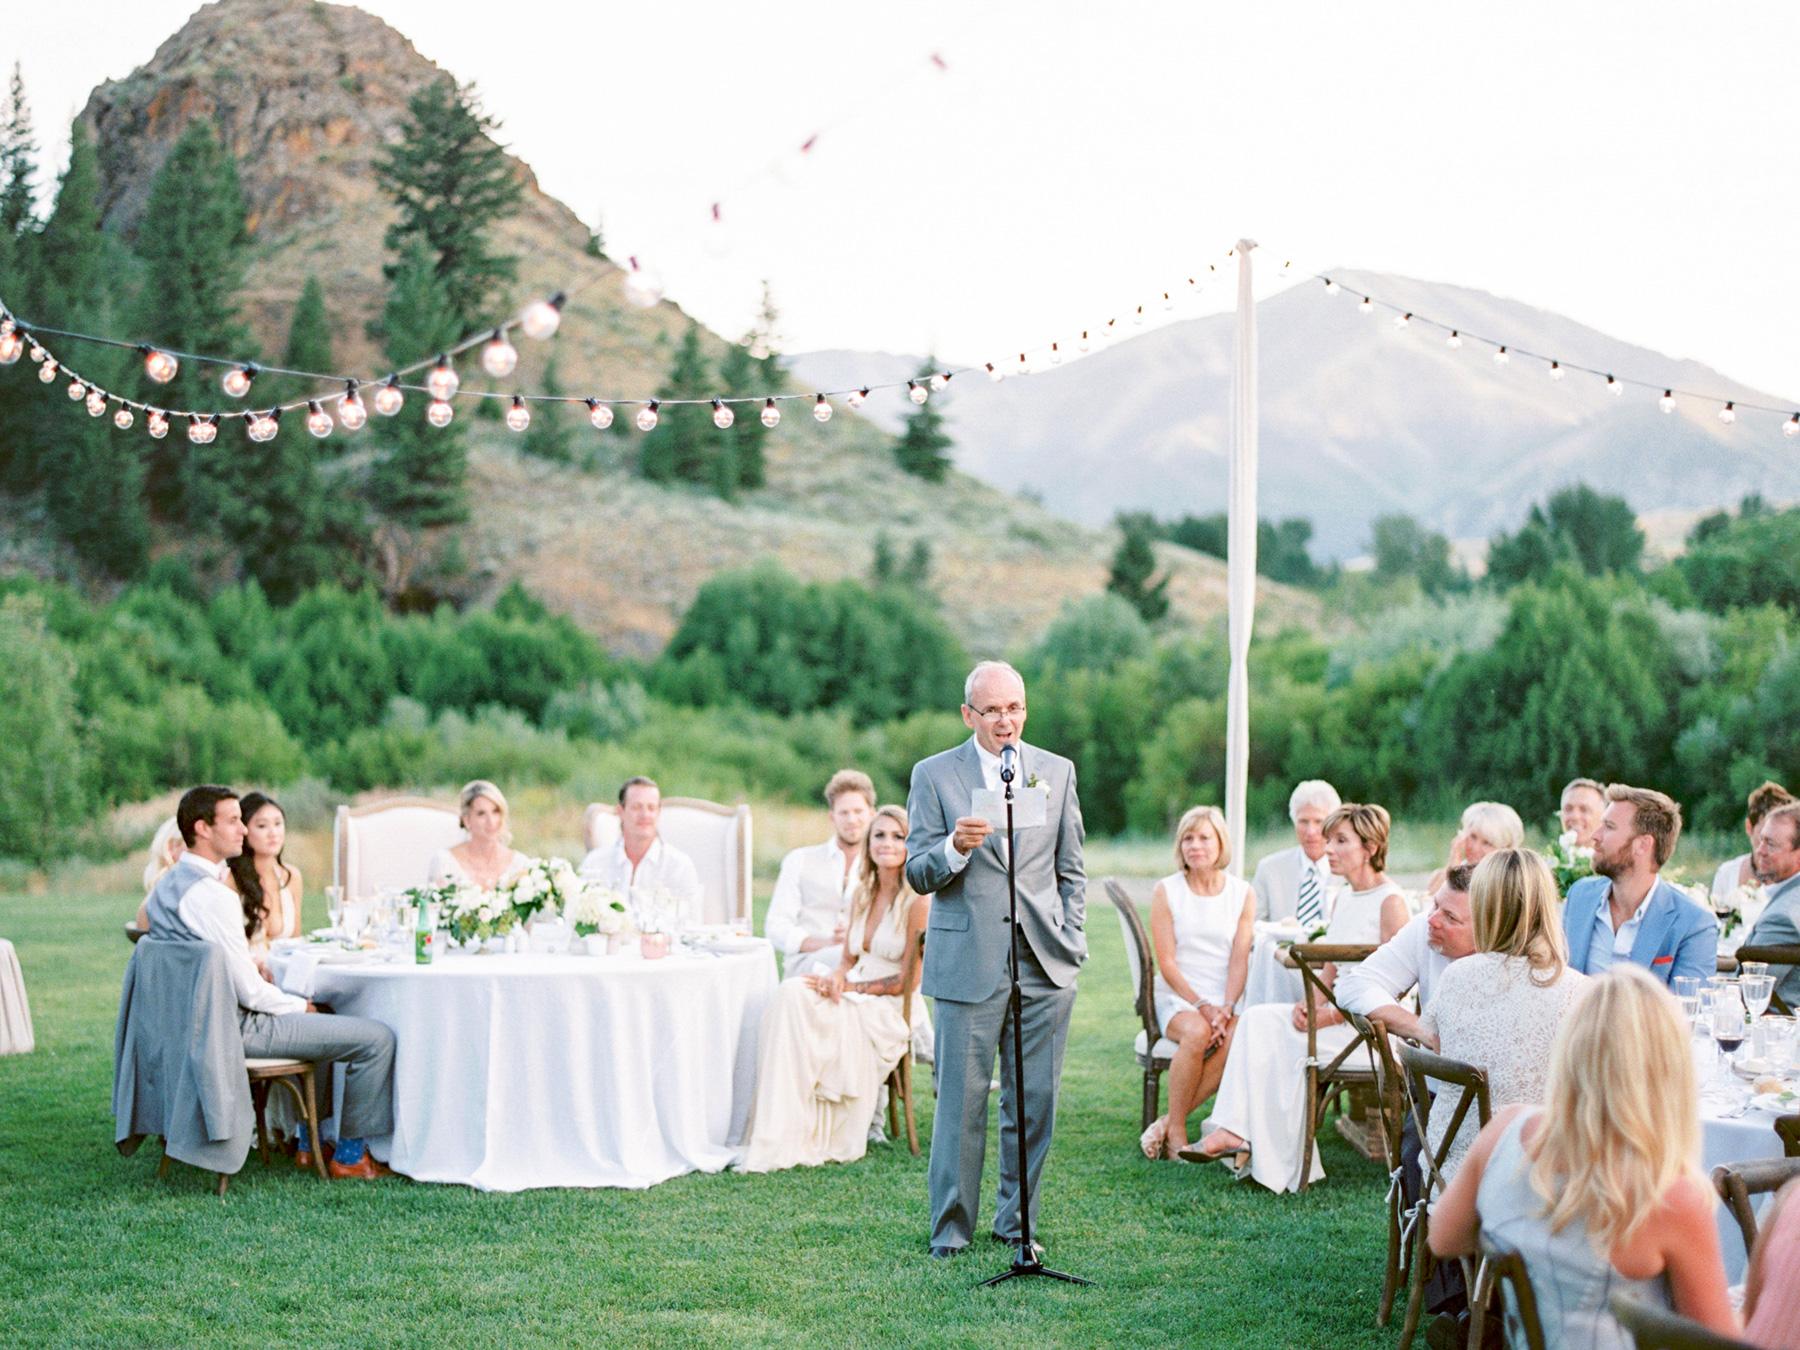 tyler-hubbard-wedding-12-1.jpg